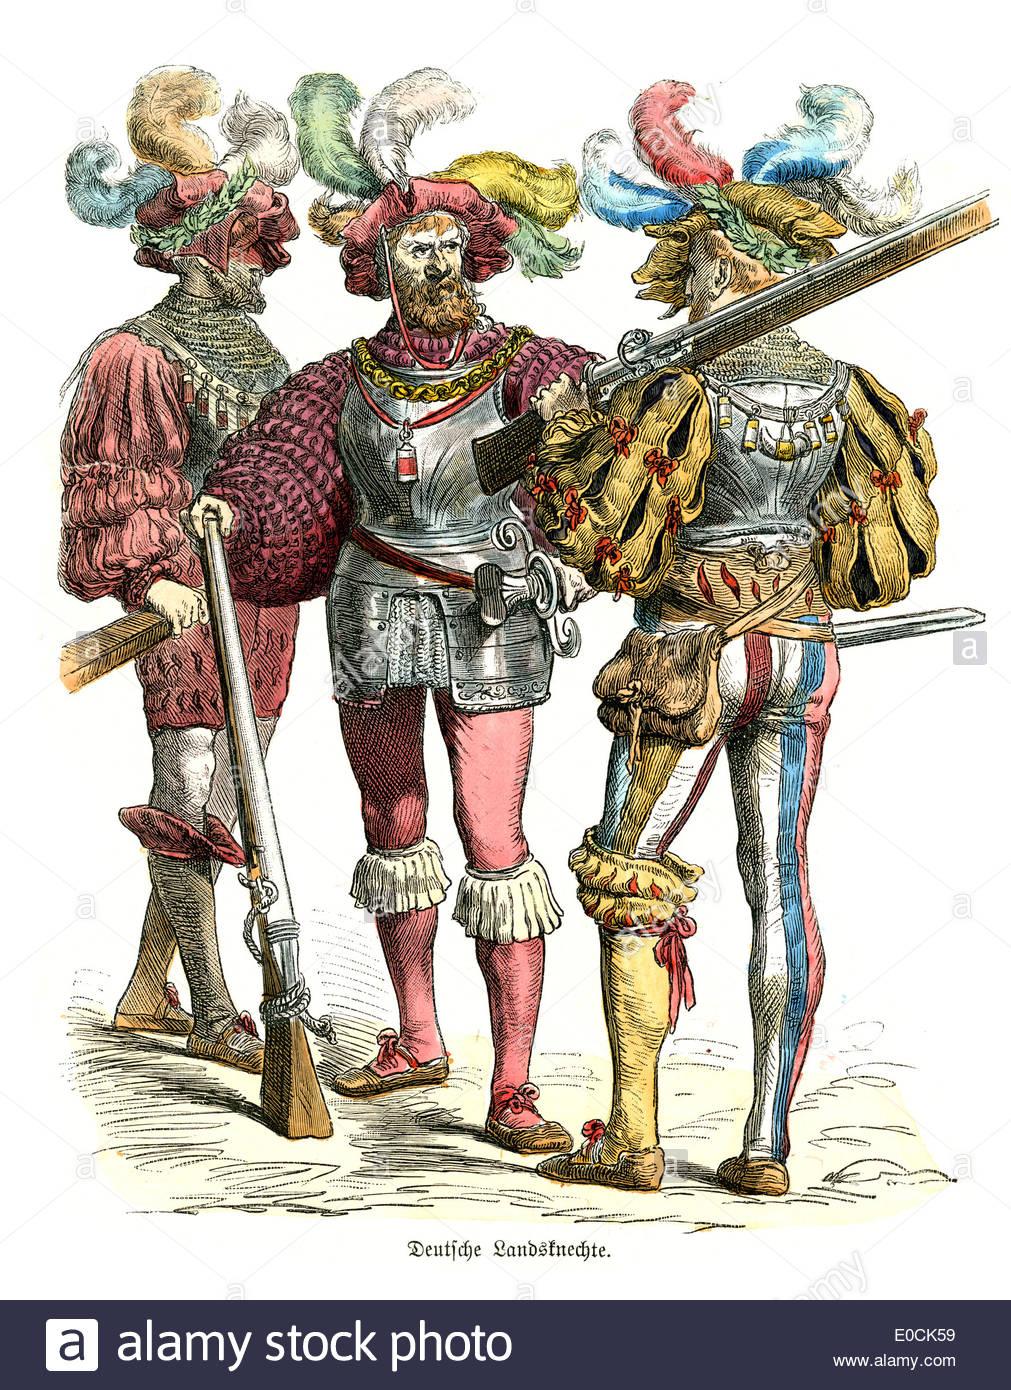 german-landsknechte-of-the-16th-century-the-german-landsknechte-were-E0CK59.jpg